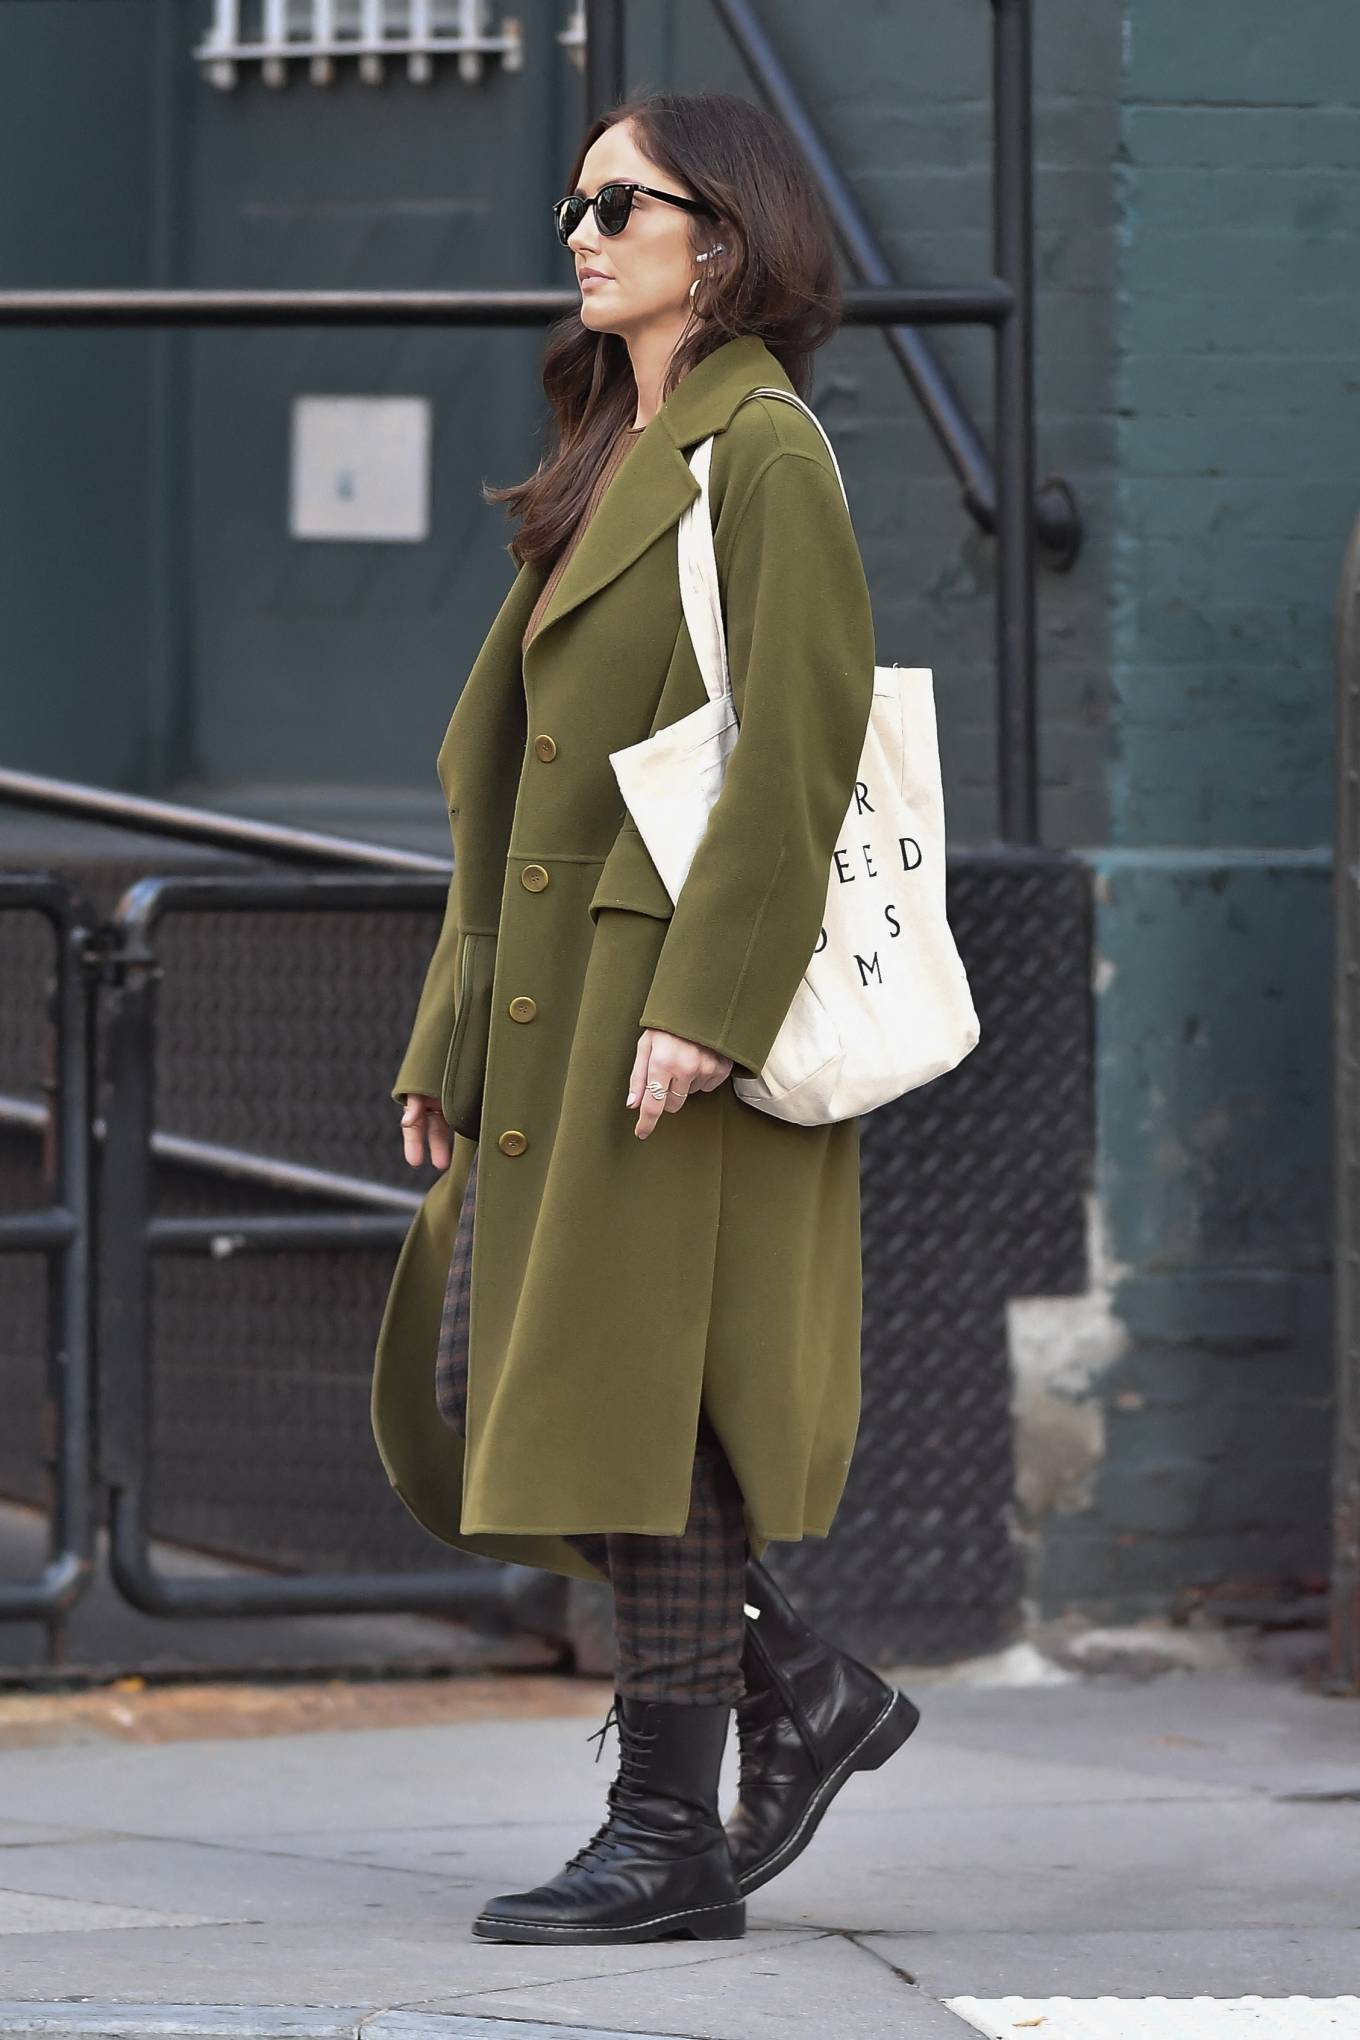 Minka Kelly 2021 : Minka Kelly – In olive green runs errands in New York-13